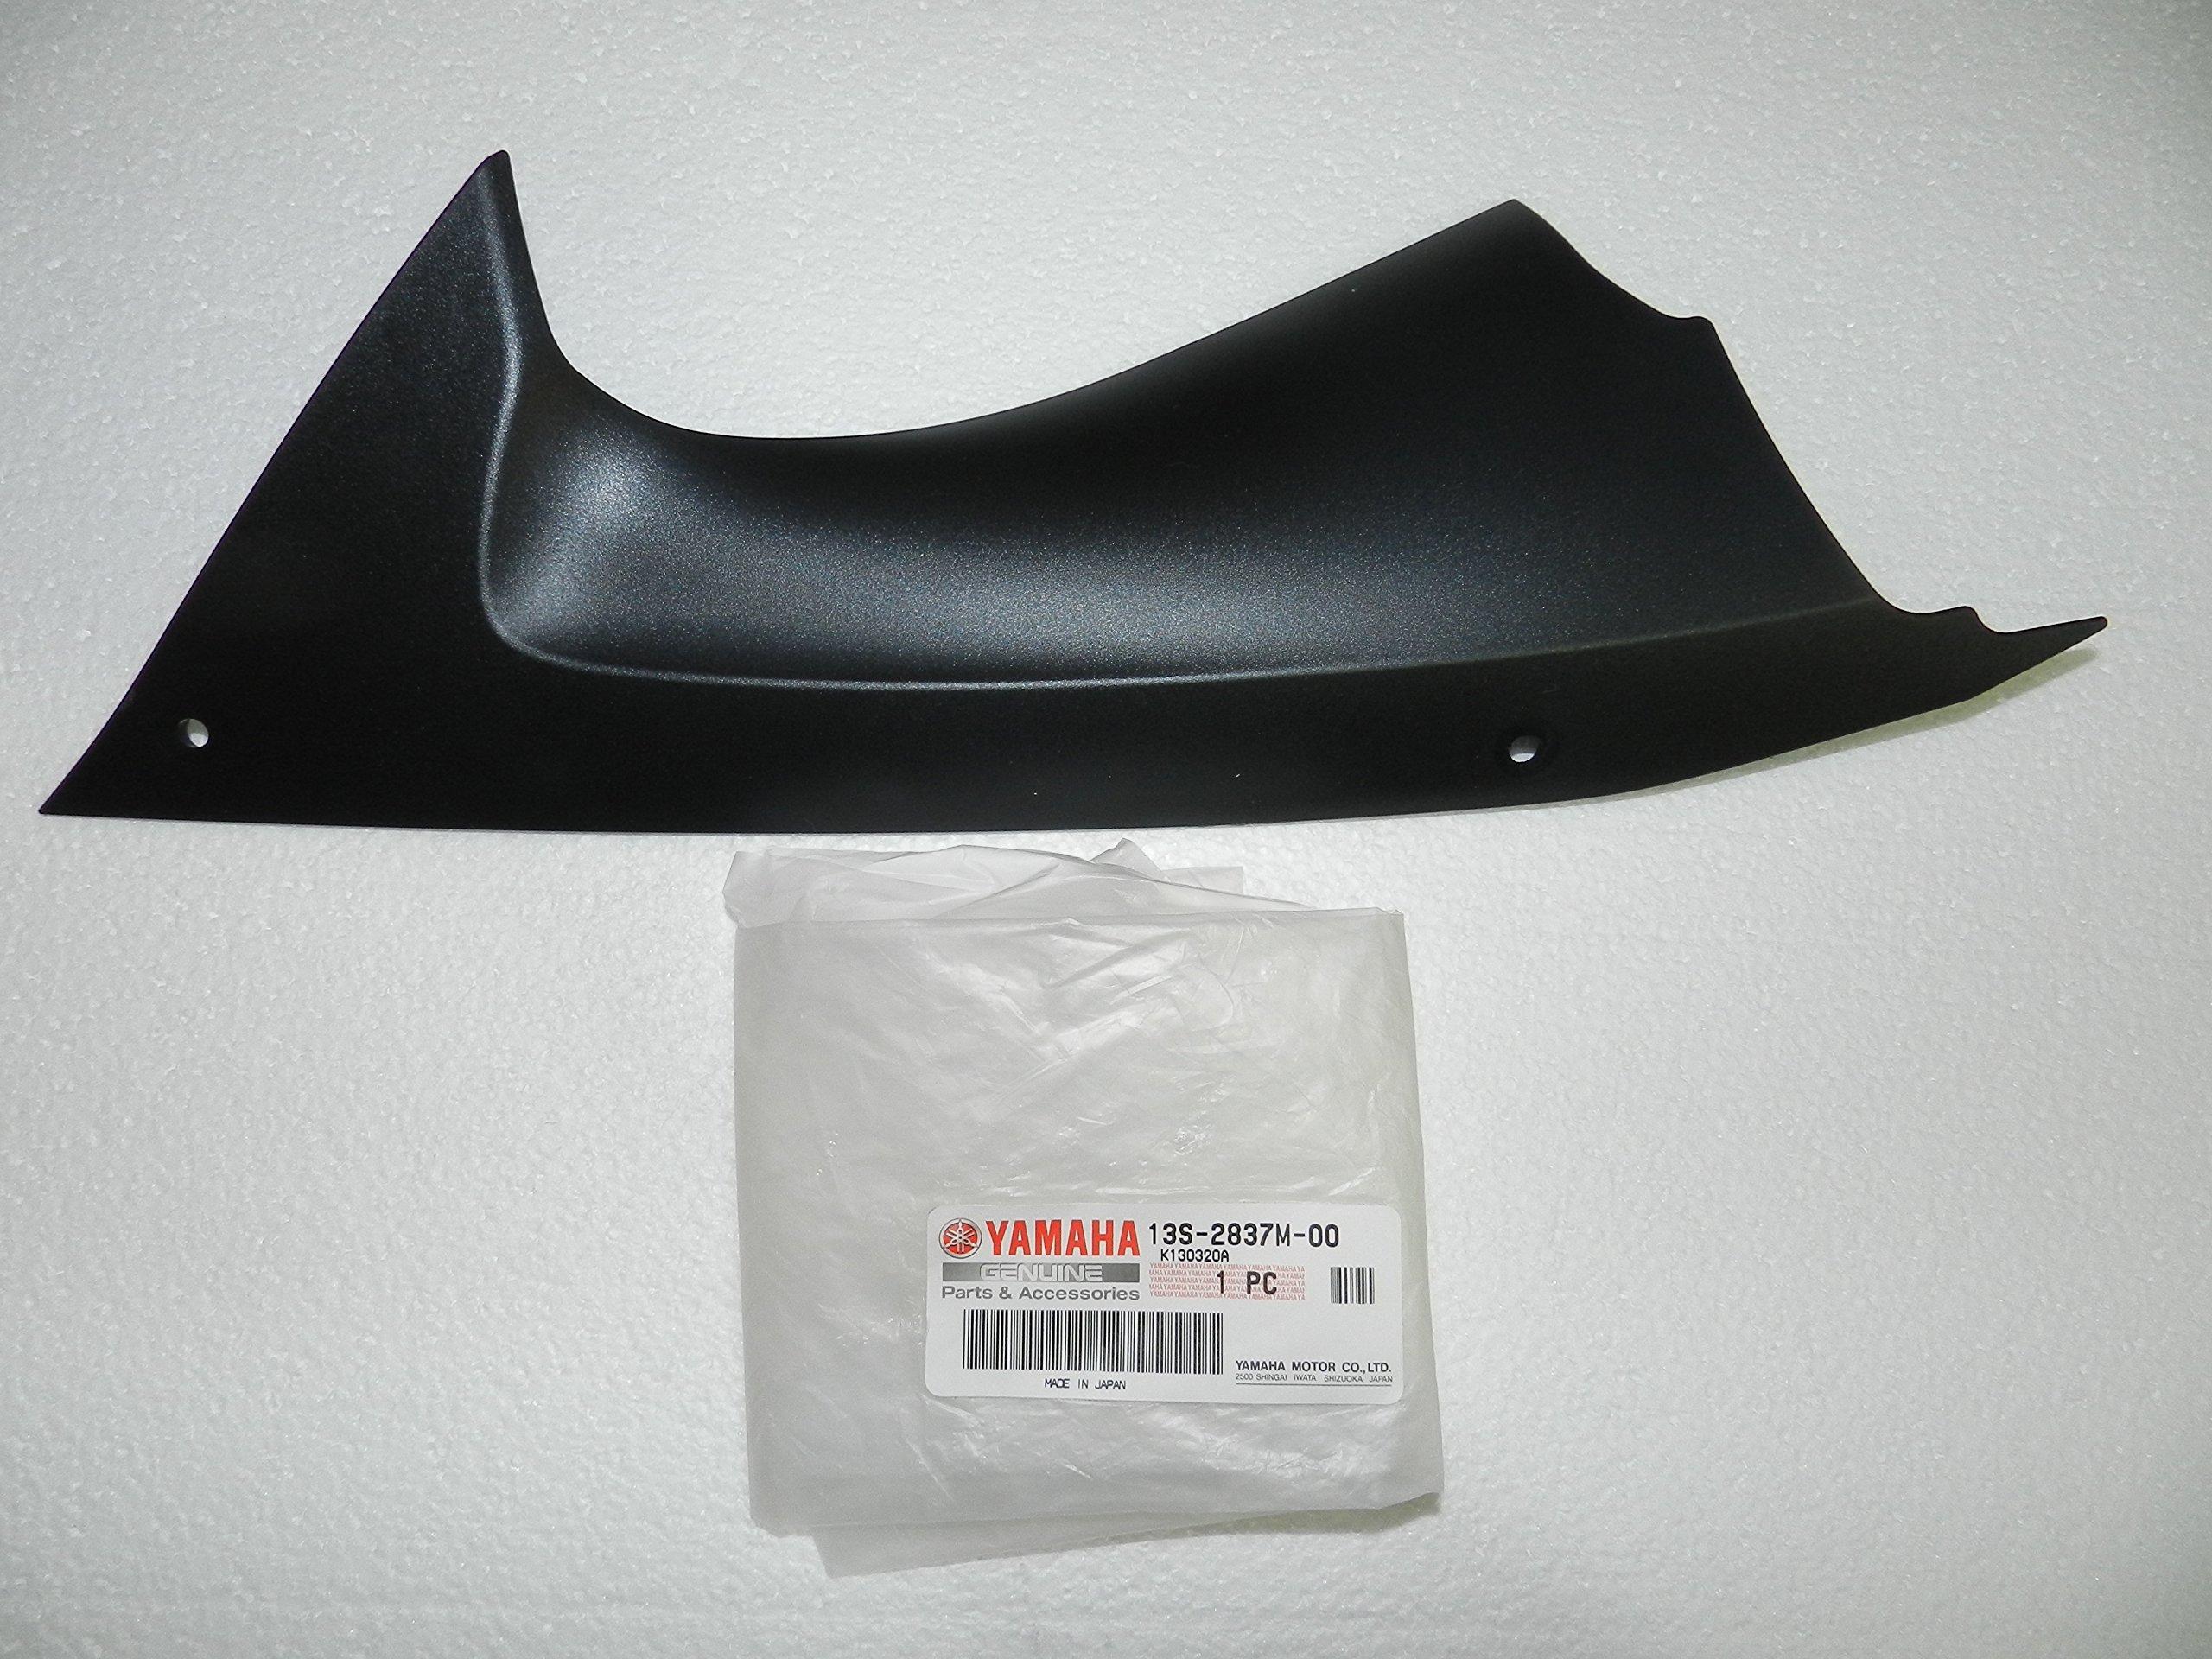 Yamaha 13S-2837M-00-00 Panel, Console 2; 13S2837M0000 Made by Yamaha